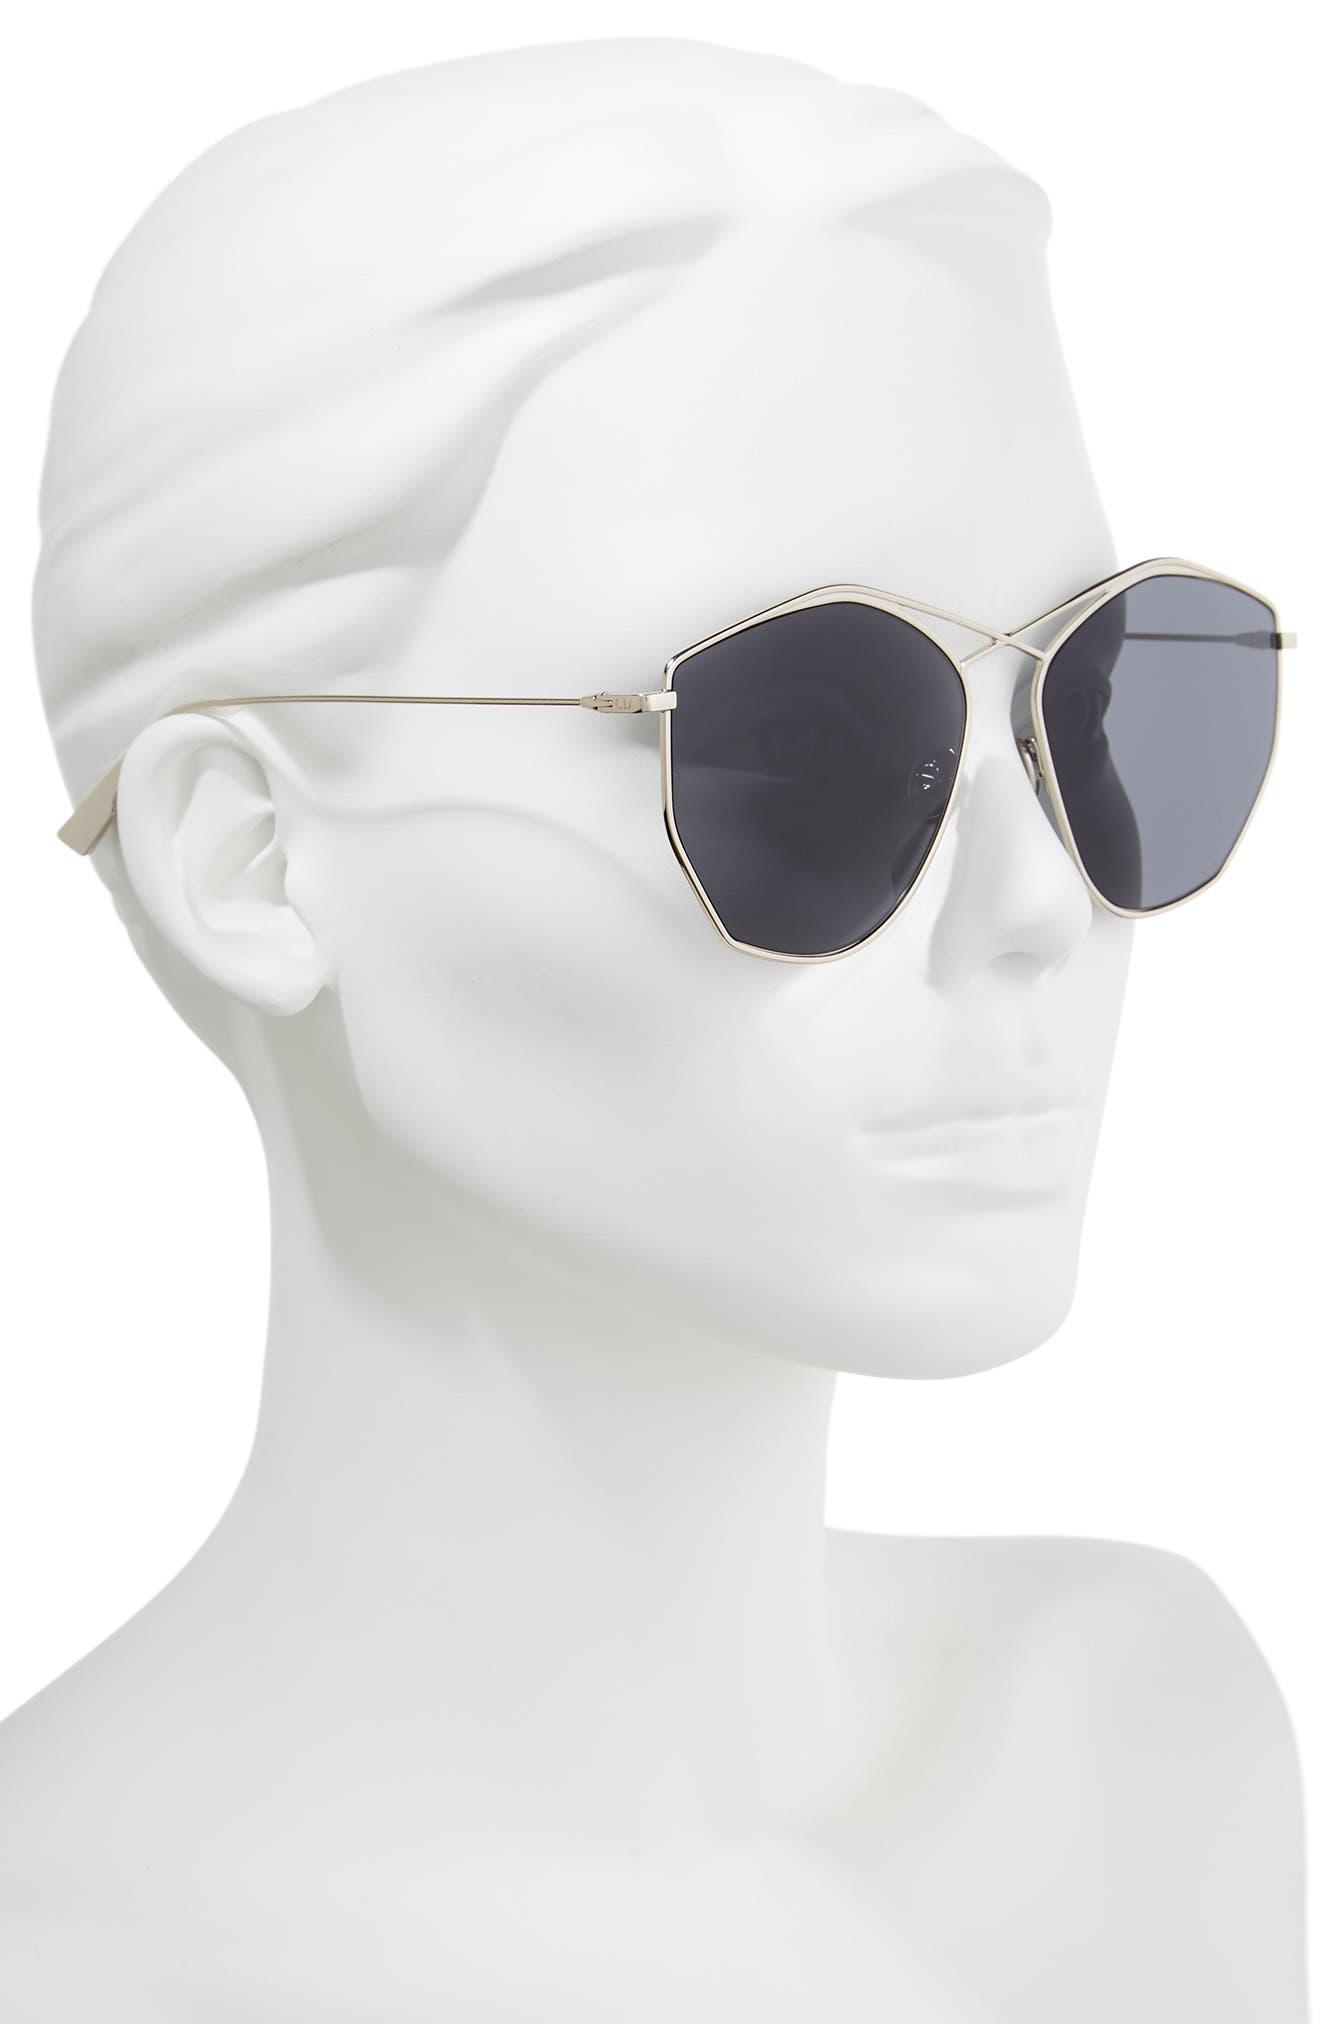 59mm Metal Sunglasses,                             Alternate thumbnail 2, color,                             LIGHT GOLD